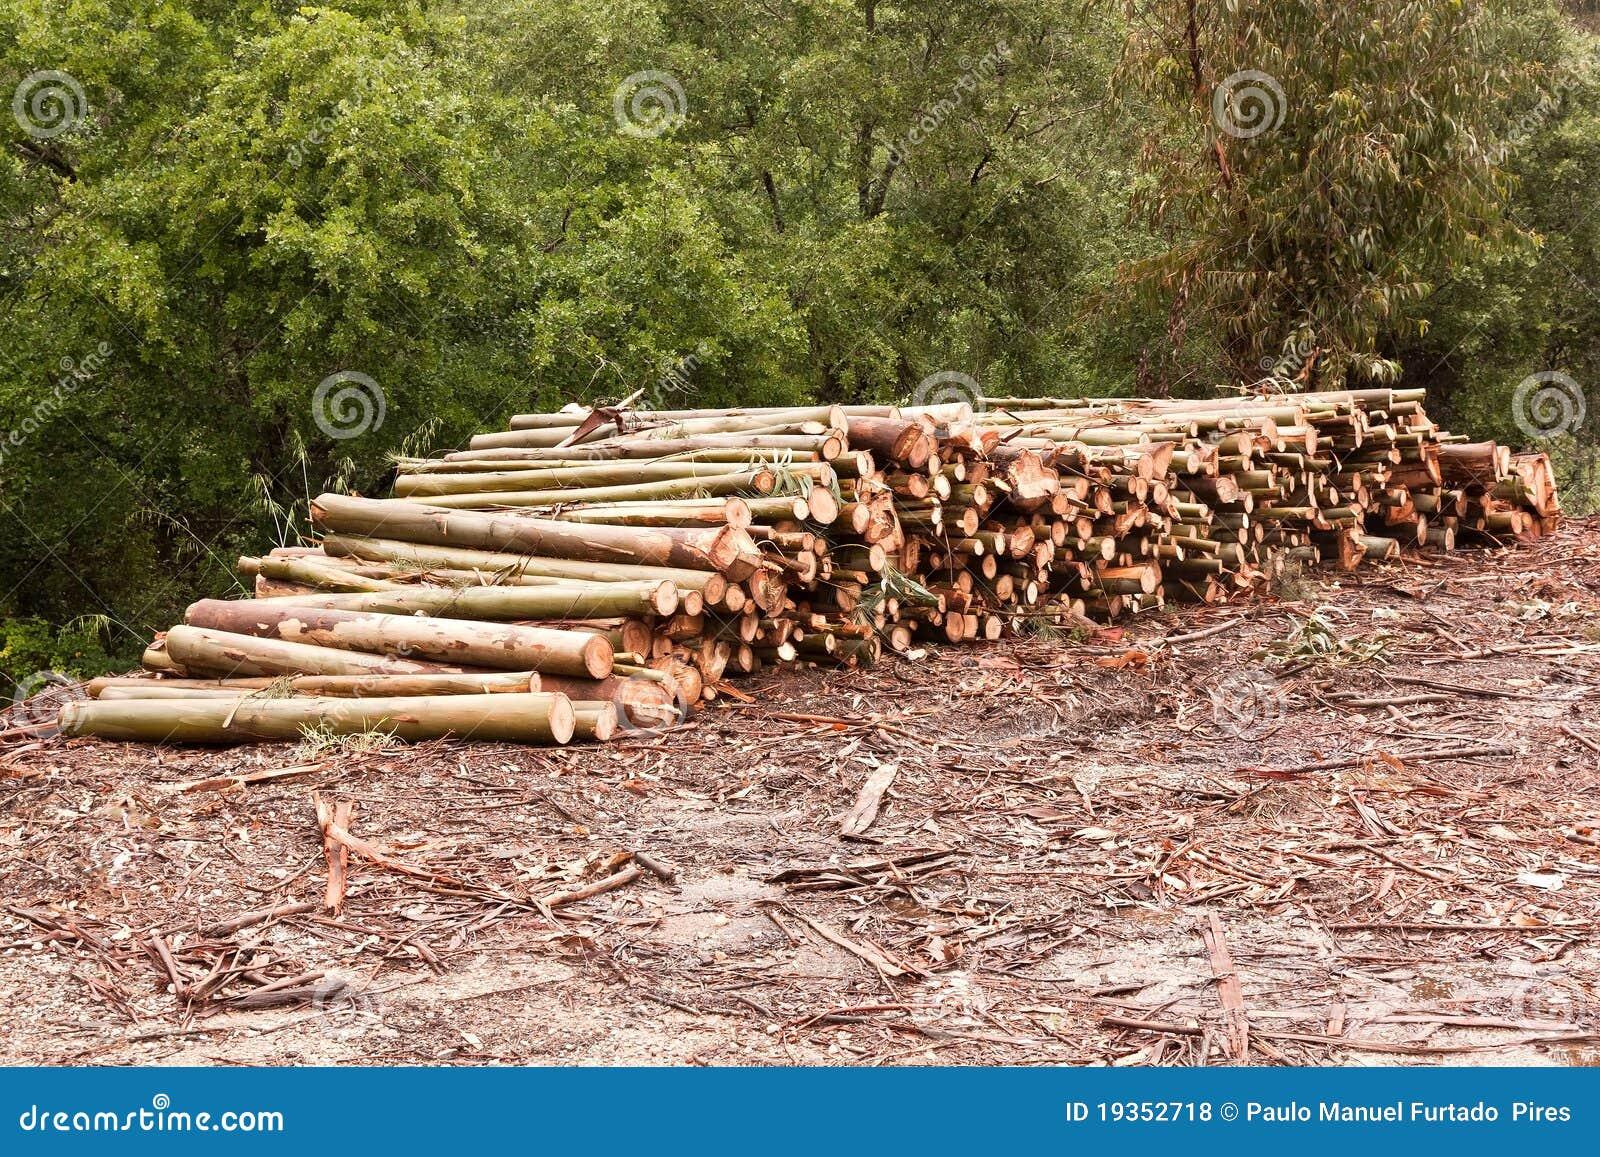 Wood Pile Royalty Free Stock Photos Image 19352718